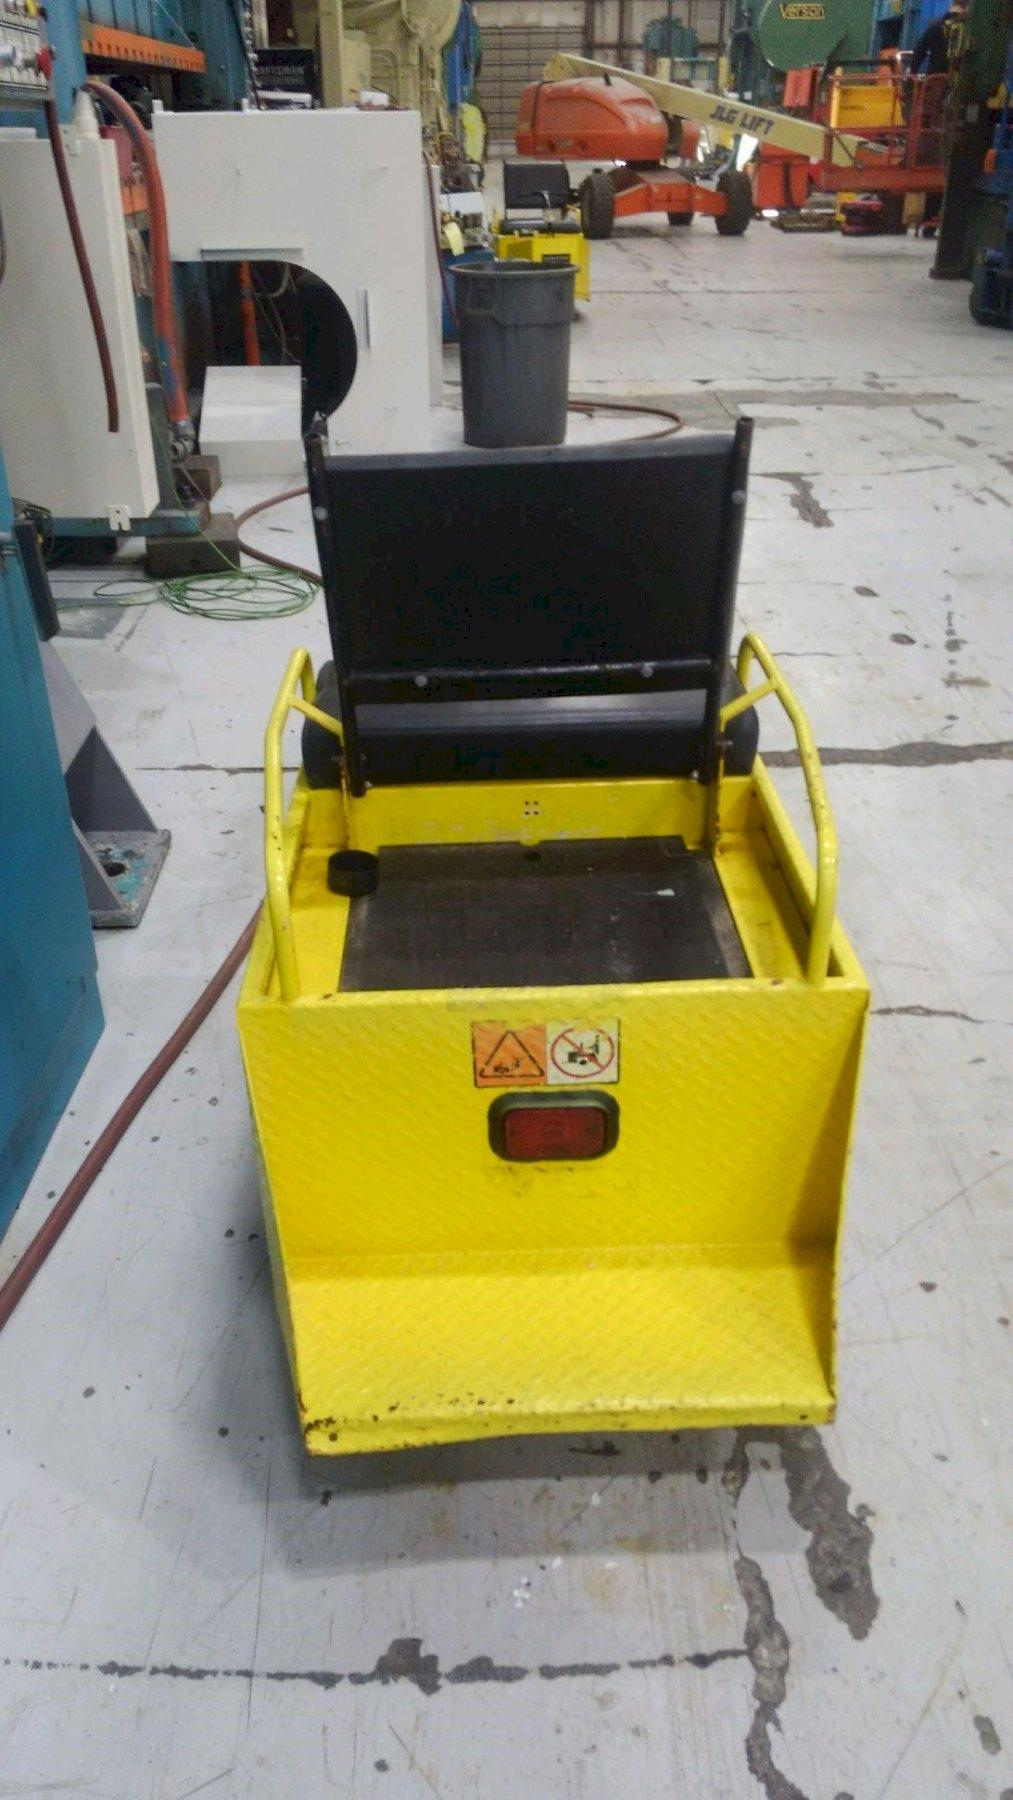 Cushman Minute Miser Electric Utility Cart